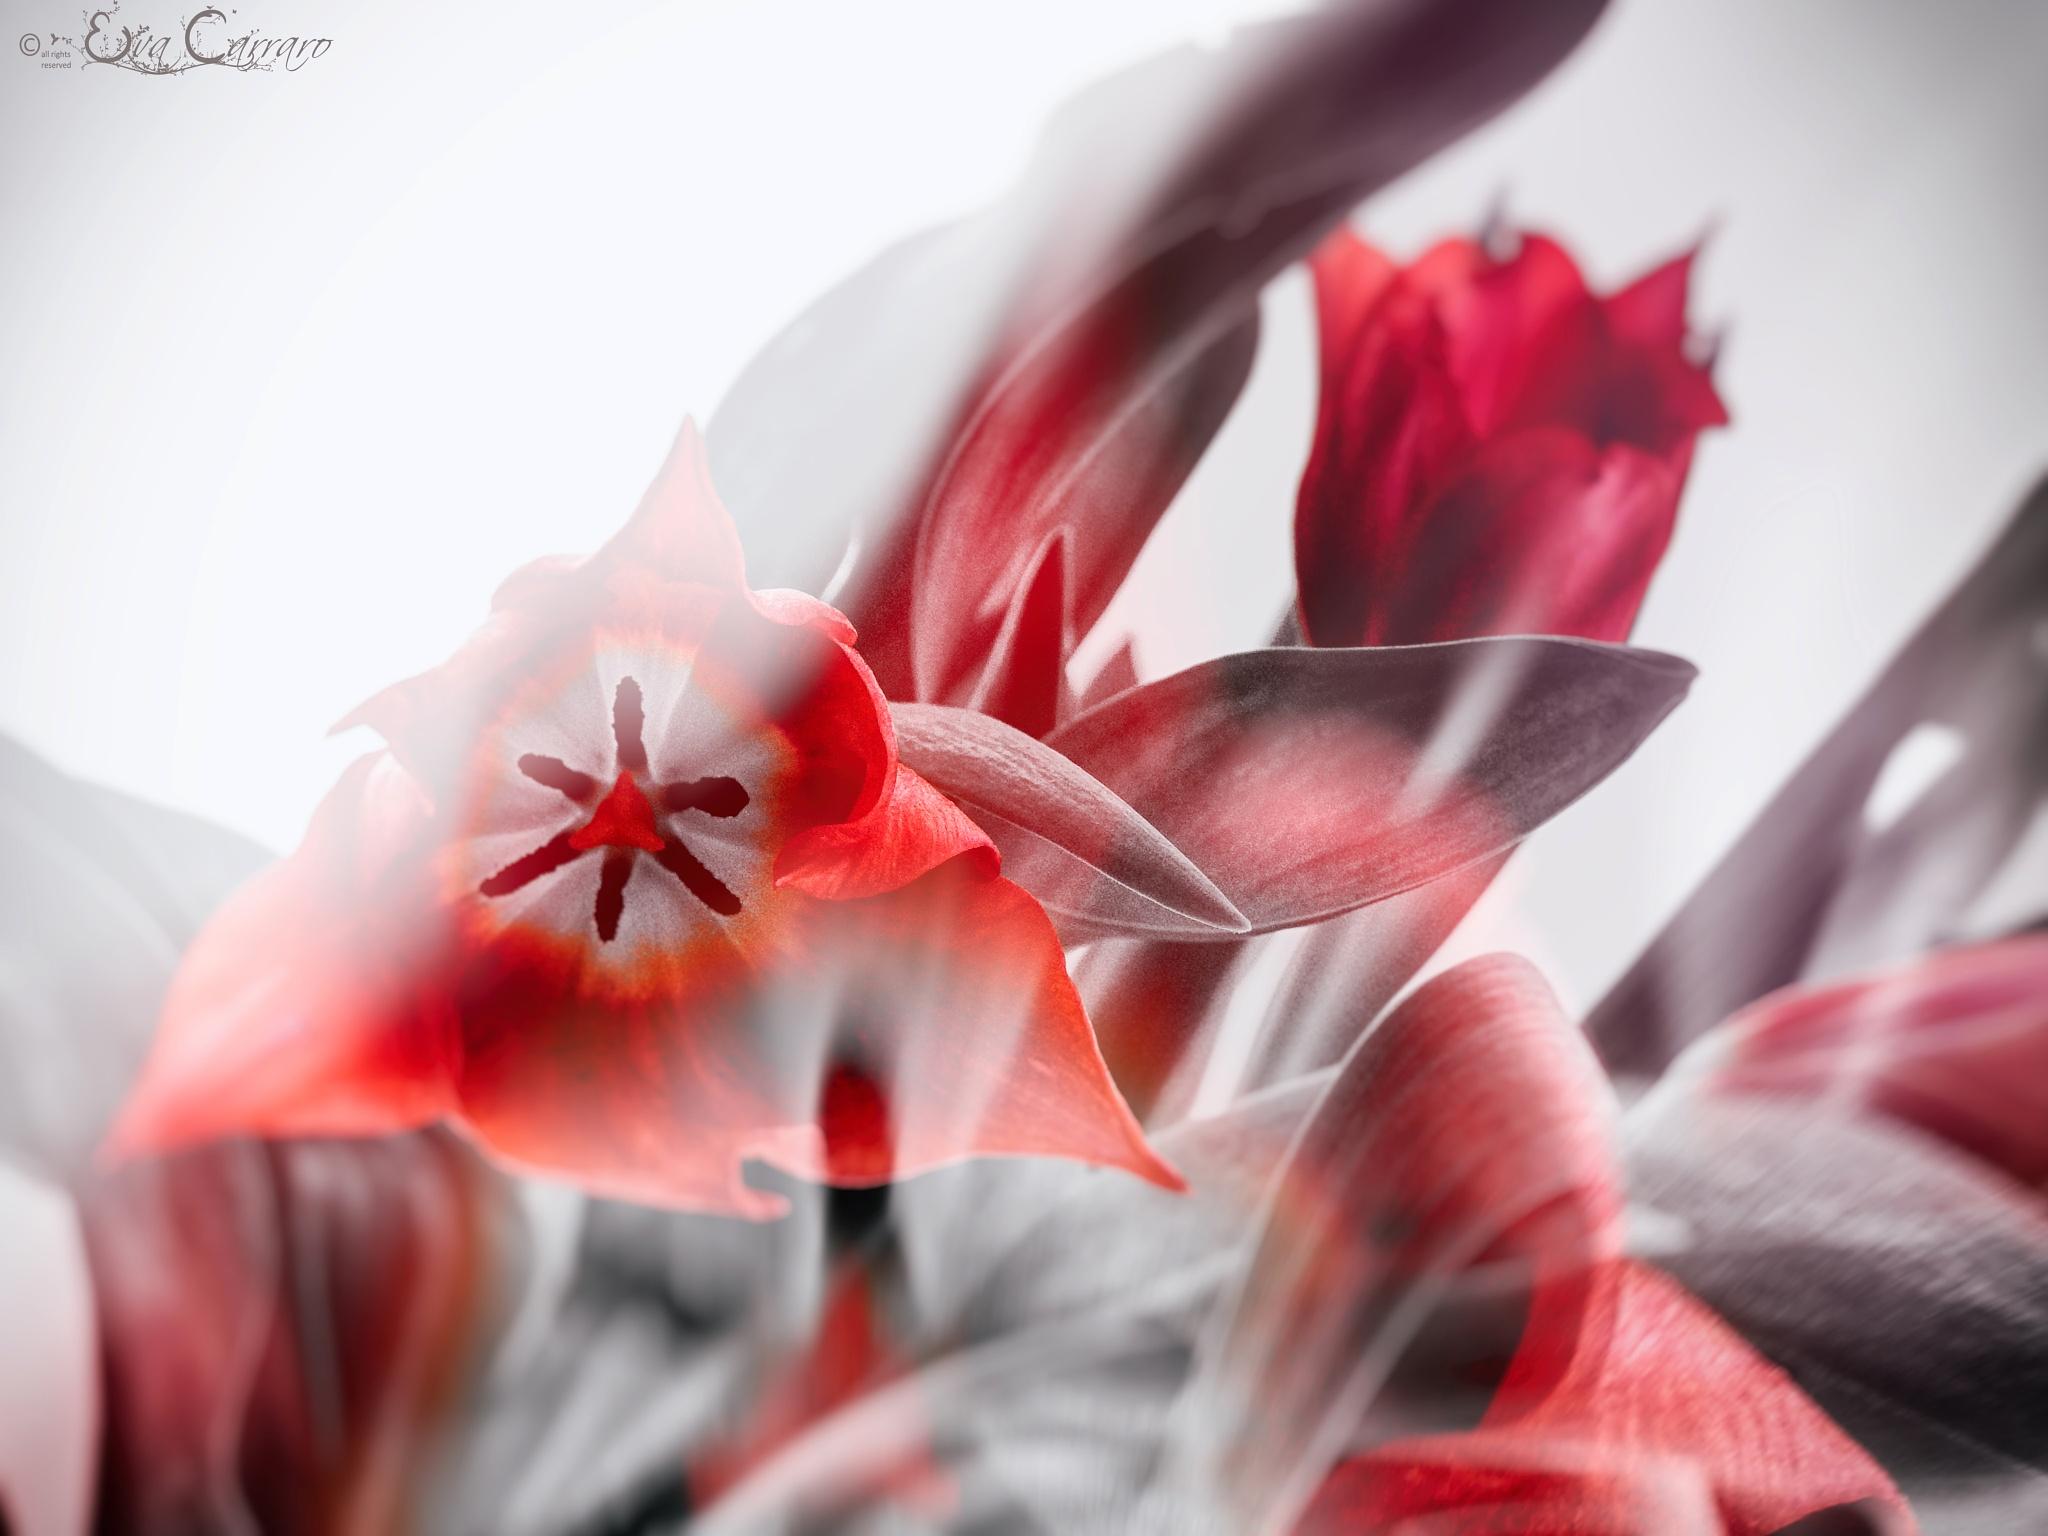 Tulips by evacarraro1969